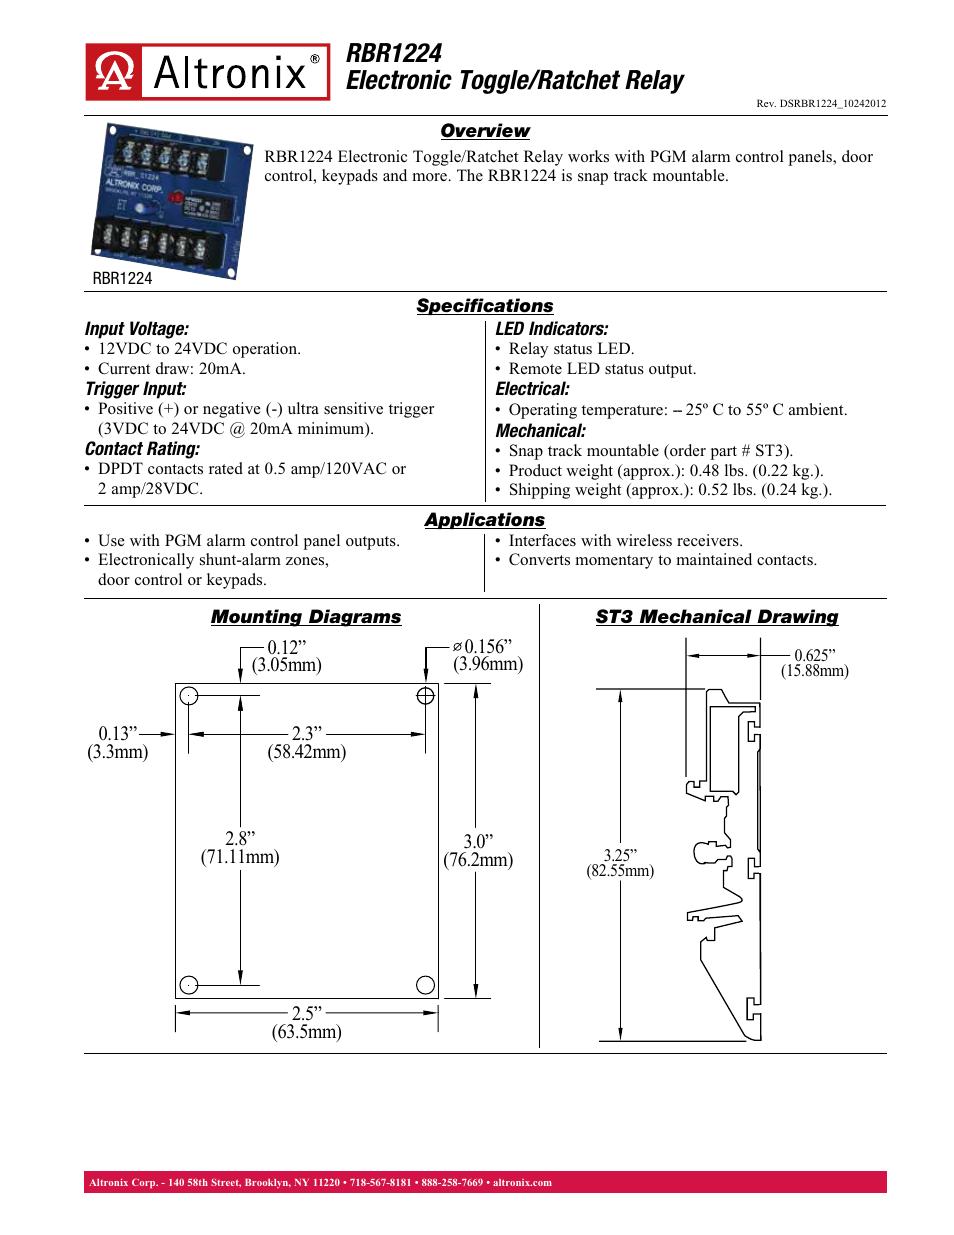 altronix relays wiring diagrams altronix rbr1224 data sheet user manual 1 page  altronix rbr1224 data sheet user manual